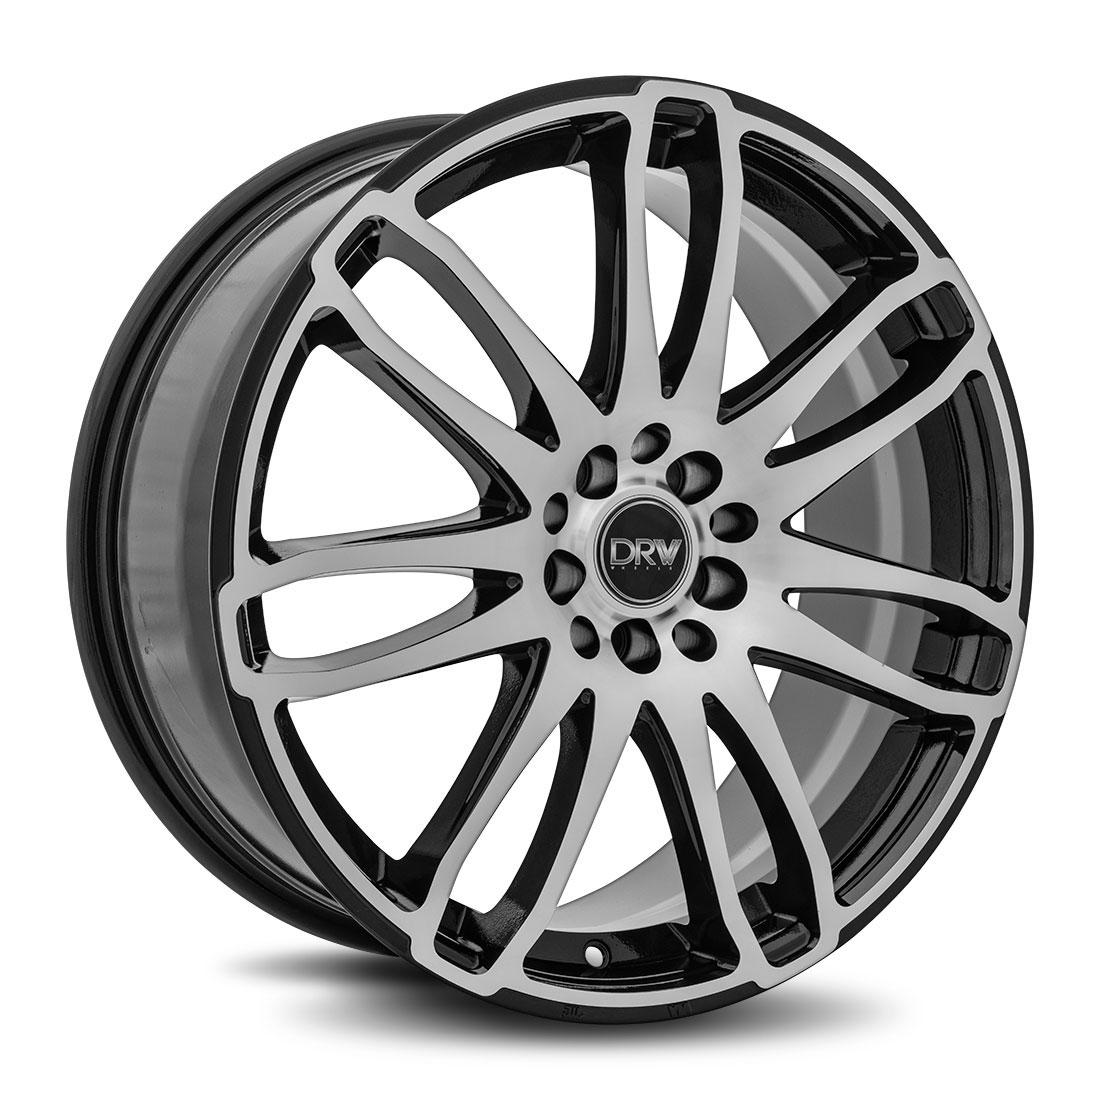 Diablo Racing Wheels DRW D14 - Gloss Black Machine Face Rim